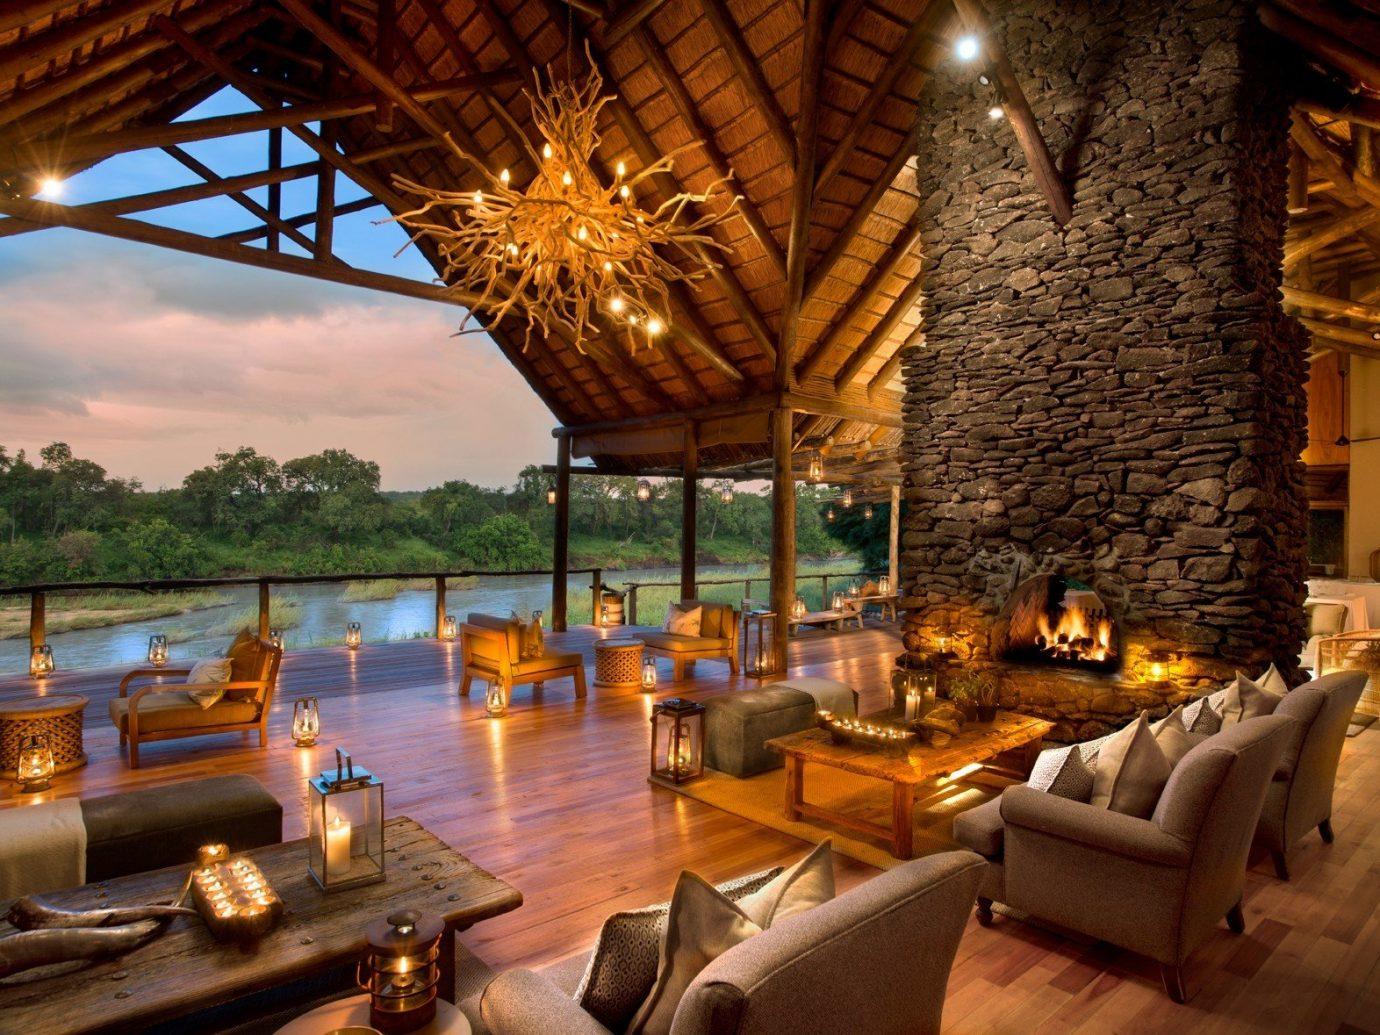 Hotels table property Resort estate Villa restaurant interior design hacienda